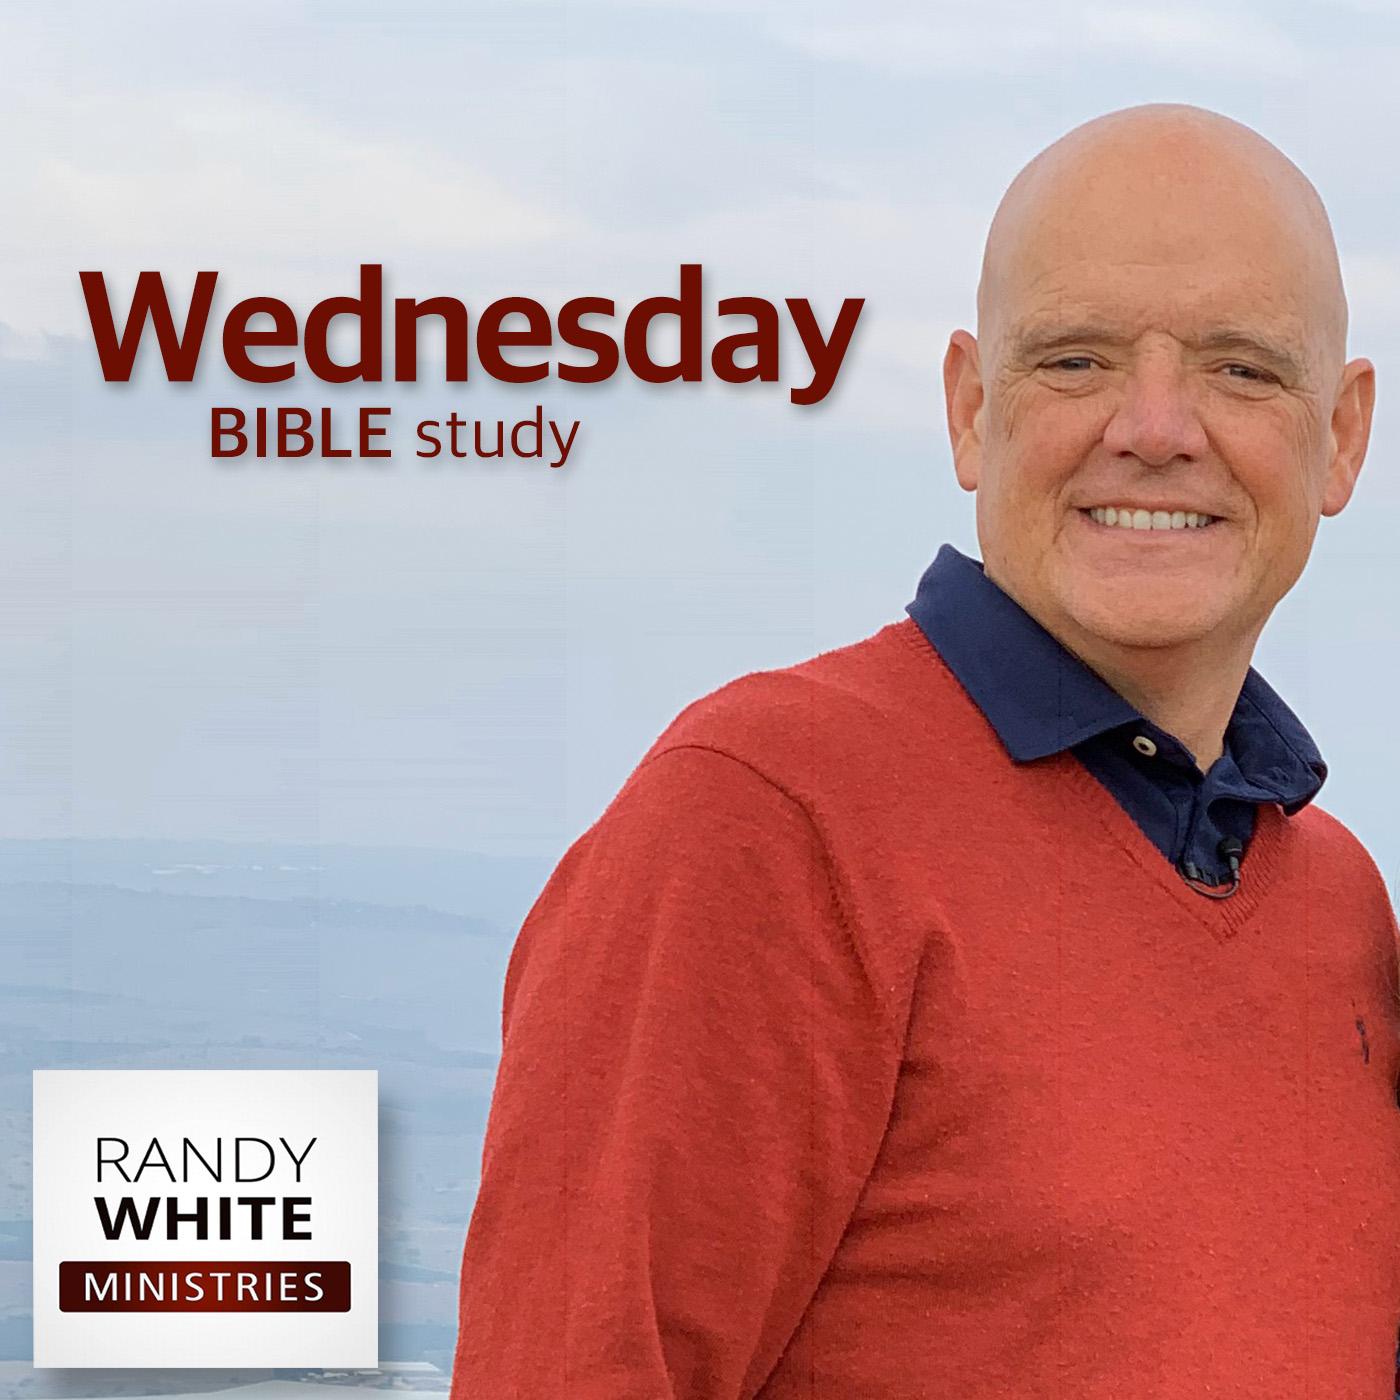 RWM: Wednesday Bible Study